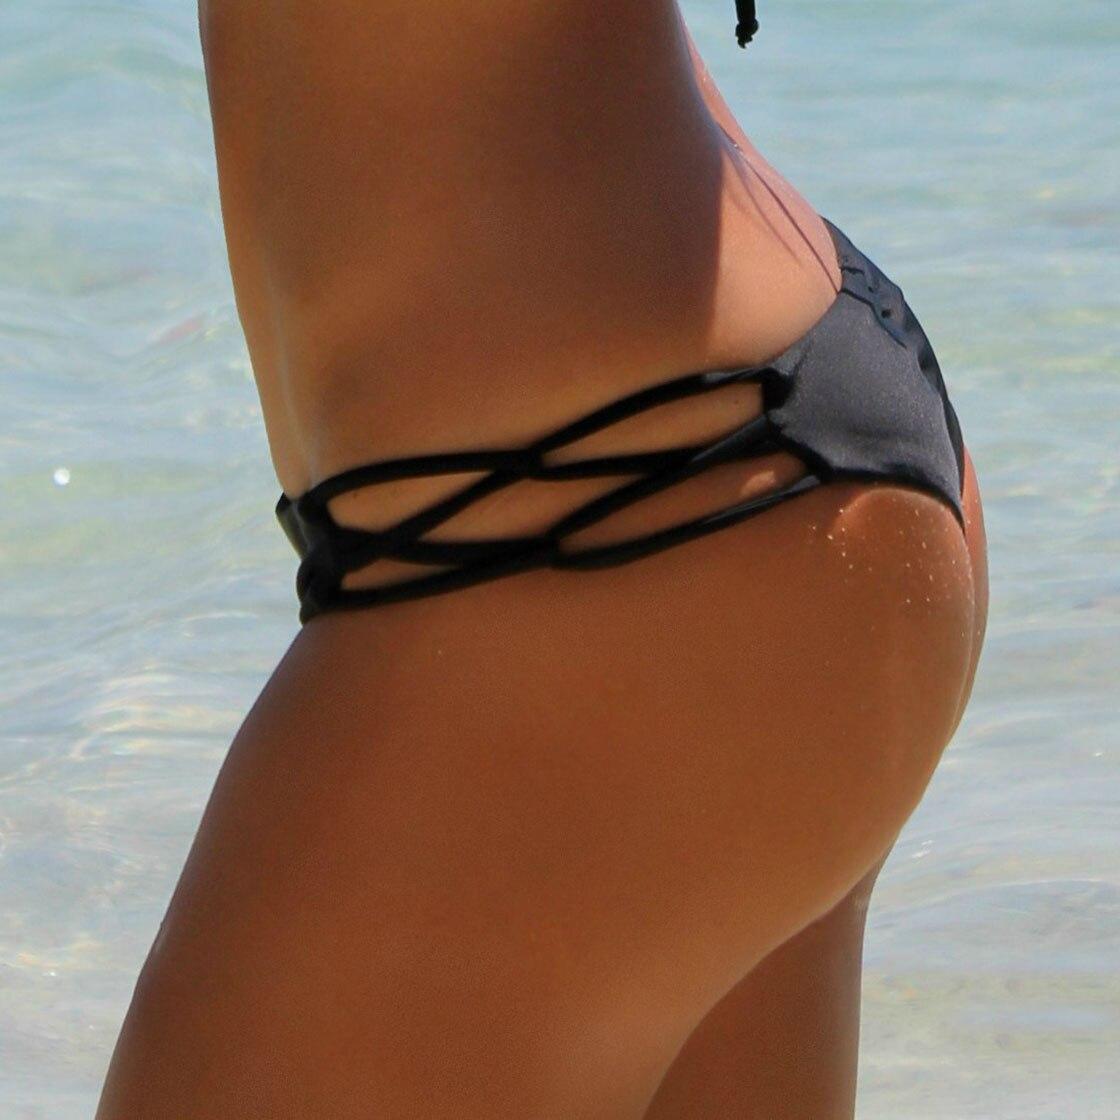 Womens Girl Bikinis Bottom Thong Sexy Swimsuit Vintage Swimwear Black Brazilian Biquini Women T-back Cheeky Bikini Bottoms